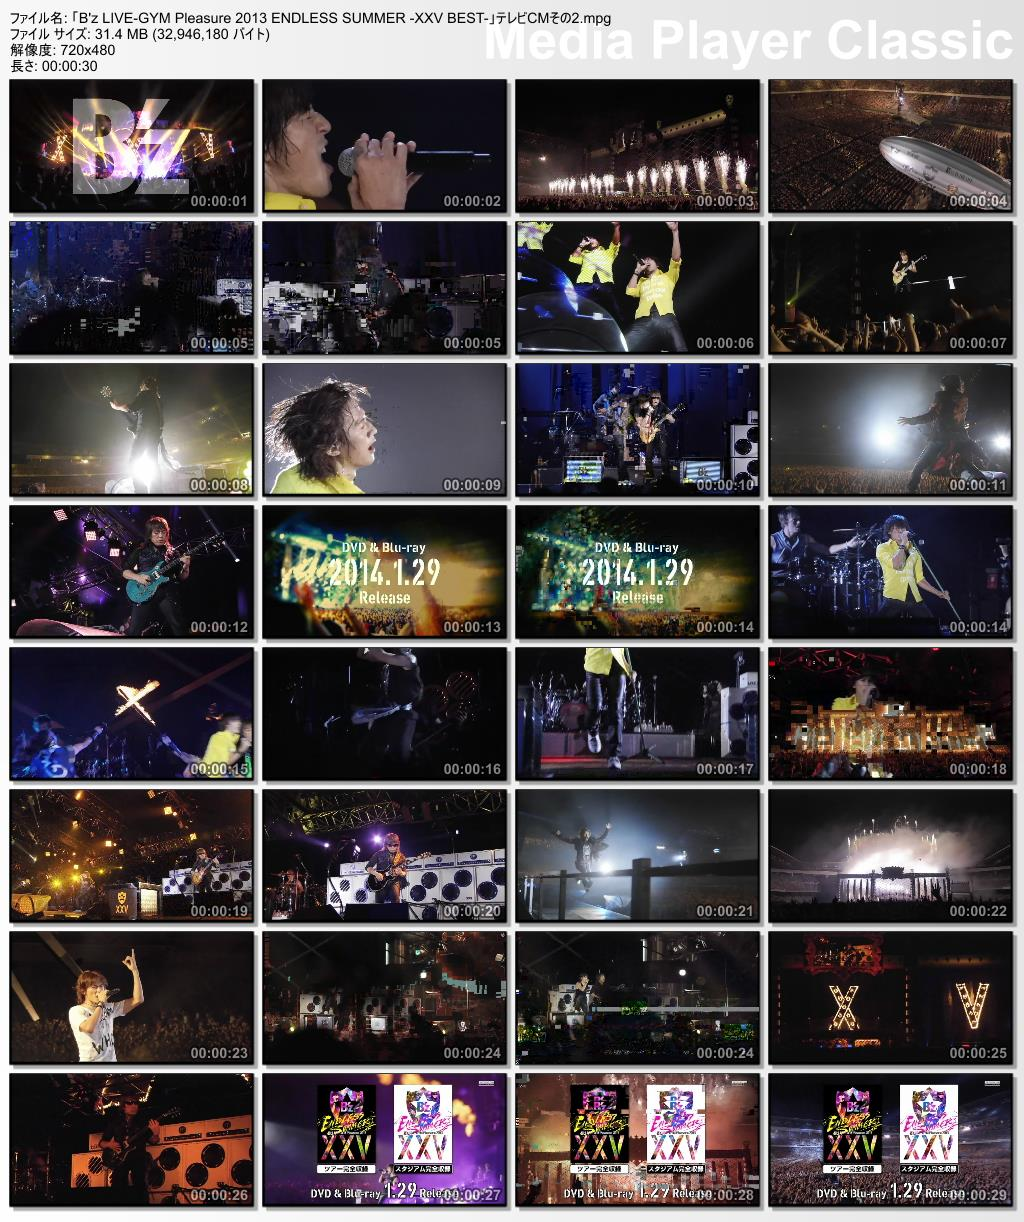 「B'z LIVE-GYM Pleasure 2013 ENDLESS SUMMER -XXV BEST-」テレビCM その2